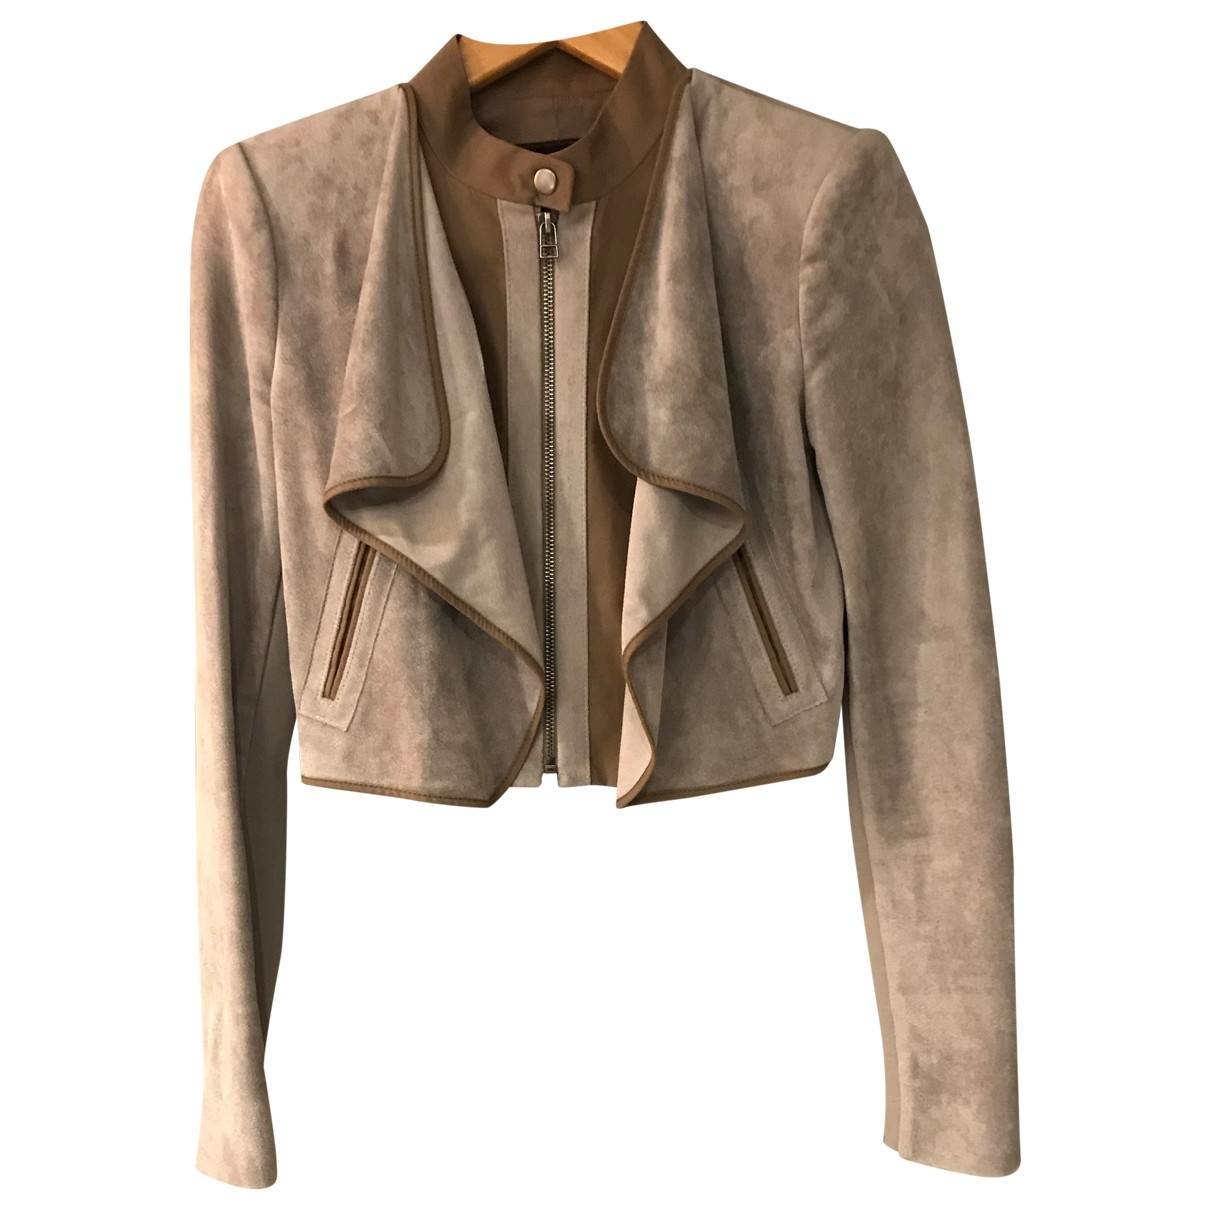 Bcbg Max Azria \N Leather jacket for Women XS International